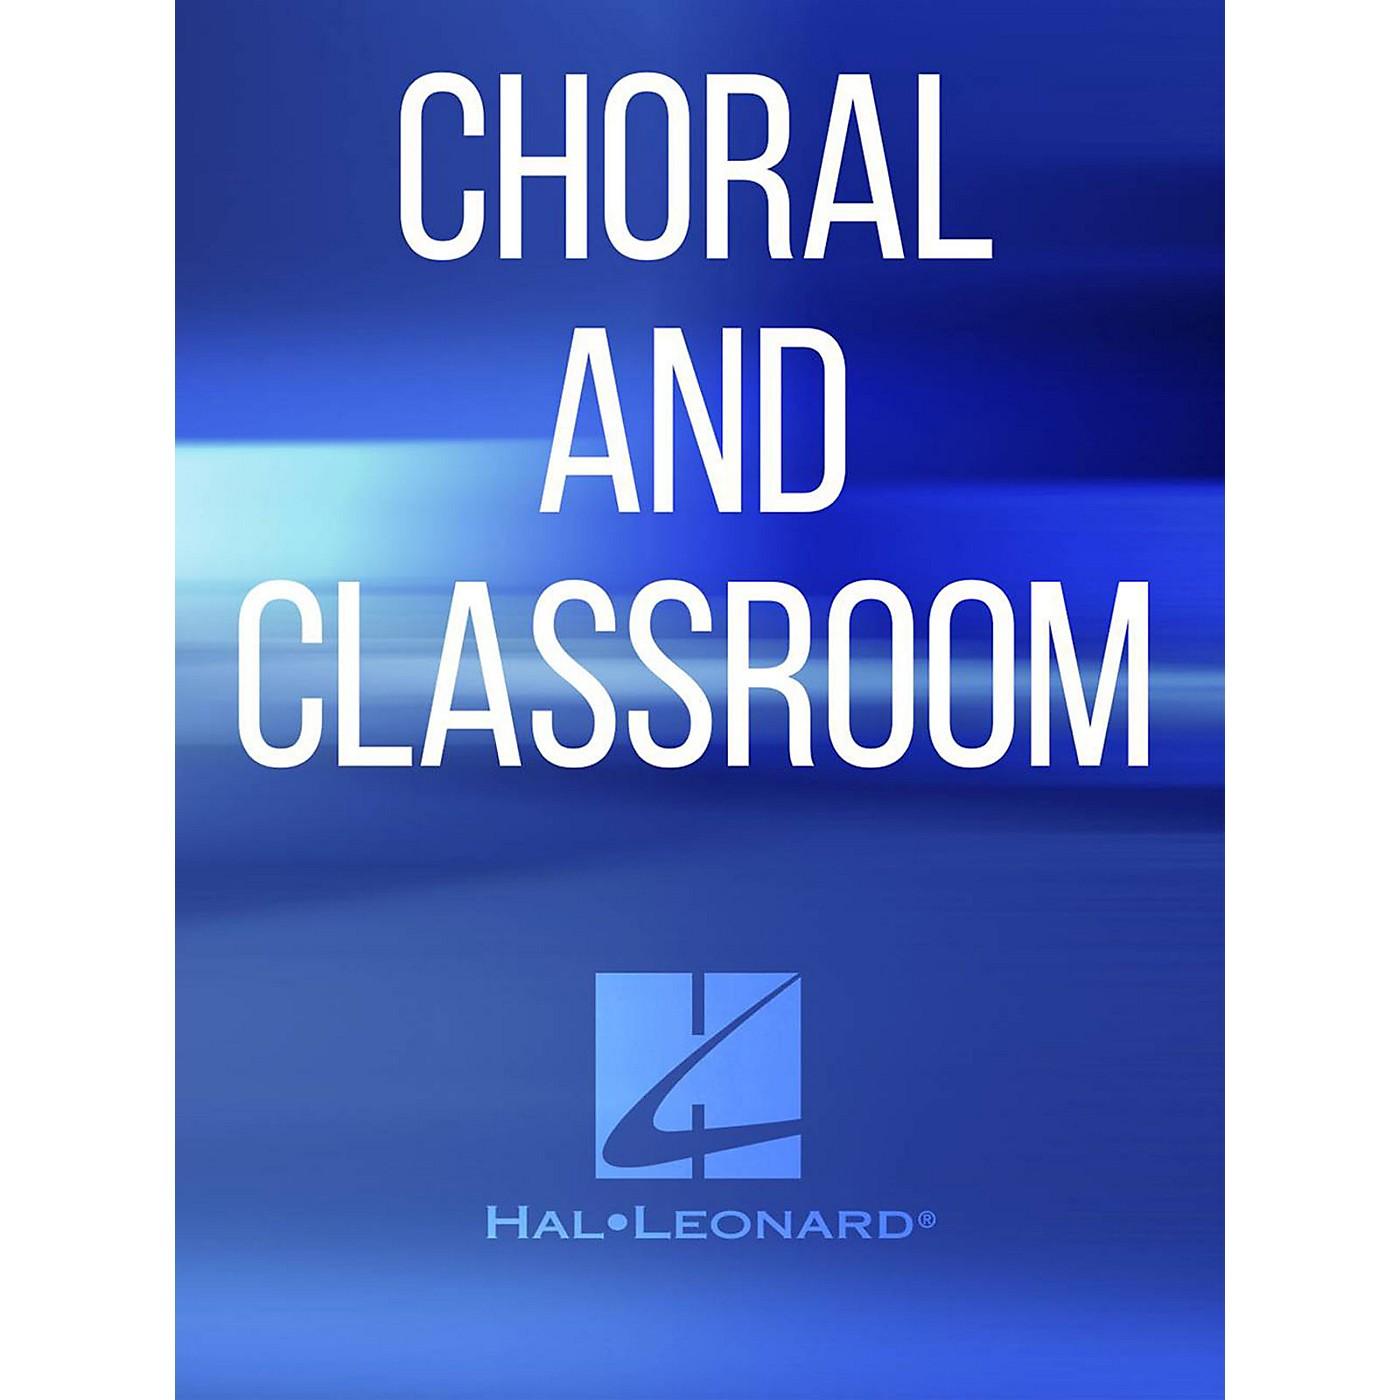 Hal Leonard Golden Dream SATB Arranged by Don Muller thumbnail